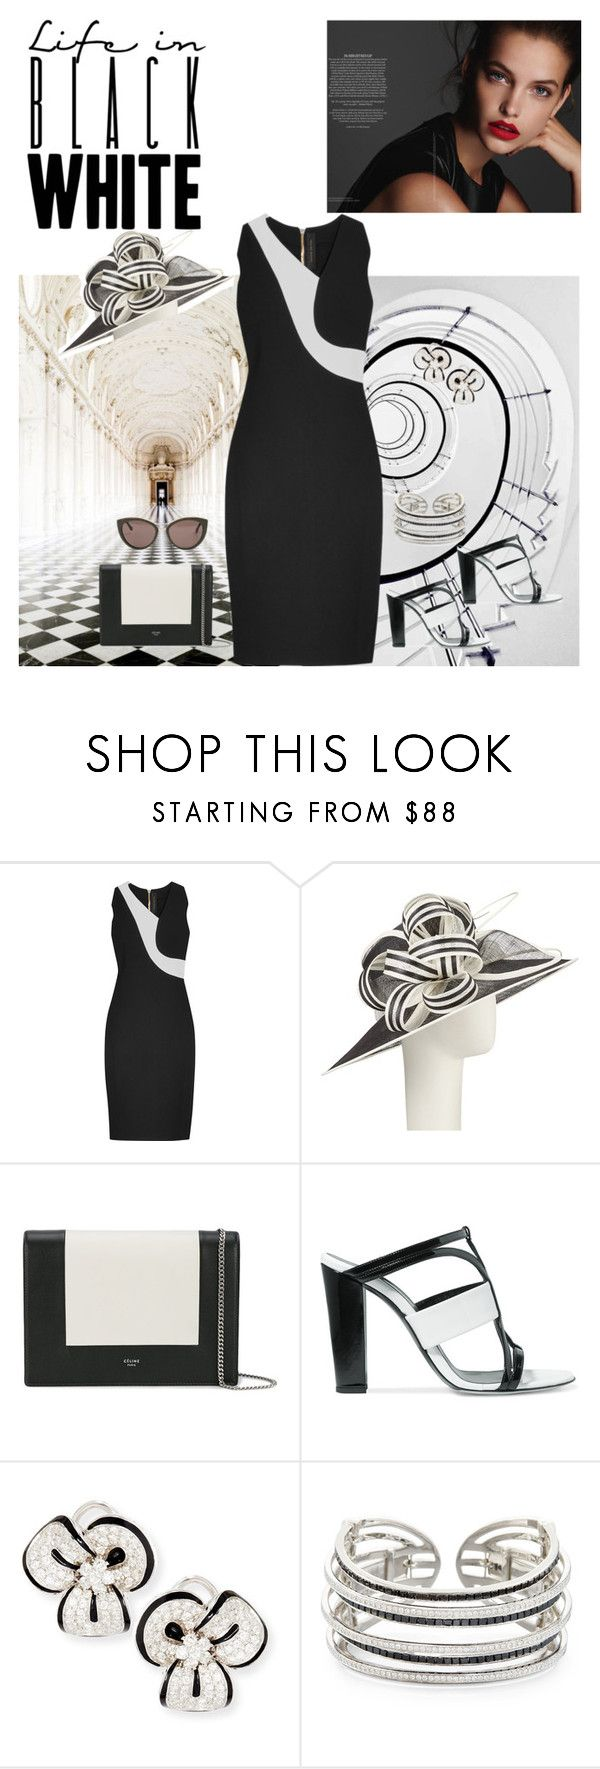 """Black & White Roland Mouret Crepe Dress"" by horcal ❤ liked on Polyvore featuring Oxford, Roland Mouret, John Lewis, CÉLINE, Oscar de la Renta, Leo Pizzo and Balenciaga"